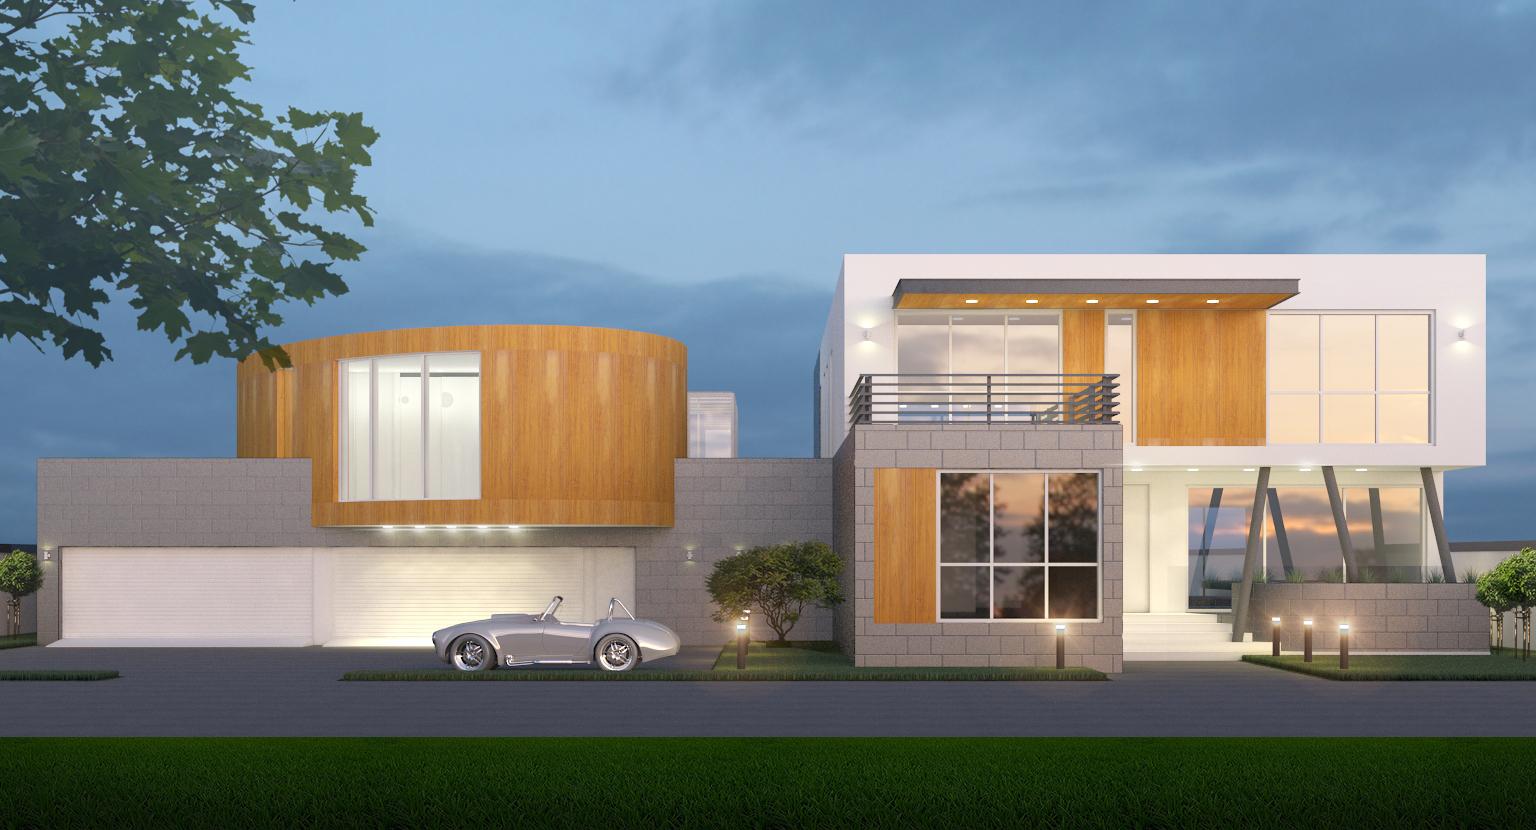 https://nbc-arhitect.ro/wp-content/uploads/2020/11/NBC-Arhitect-_-residences-_-Laguna-Residence-_-exterior-view-_-.jpg